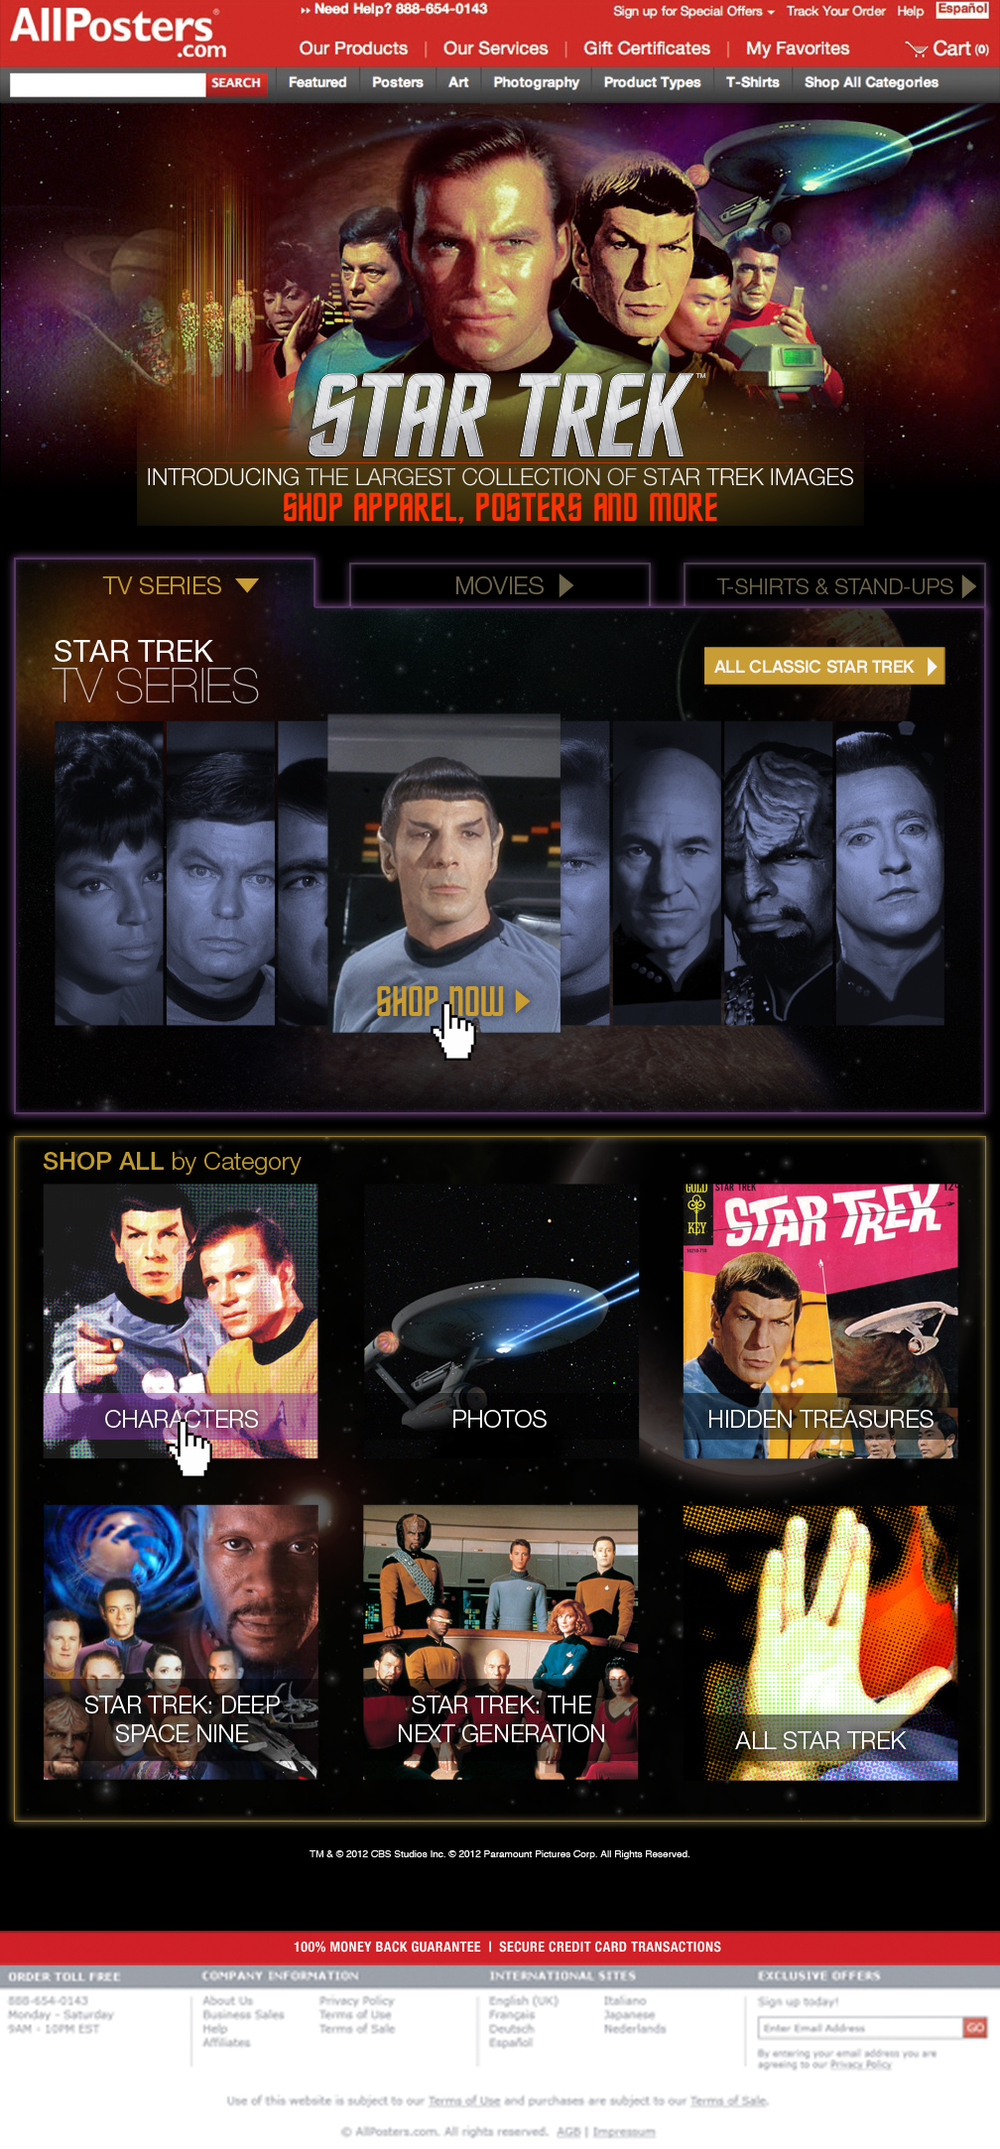 AllPosters.com Star Trek Landing Page.jpg